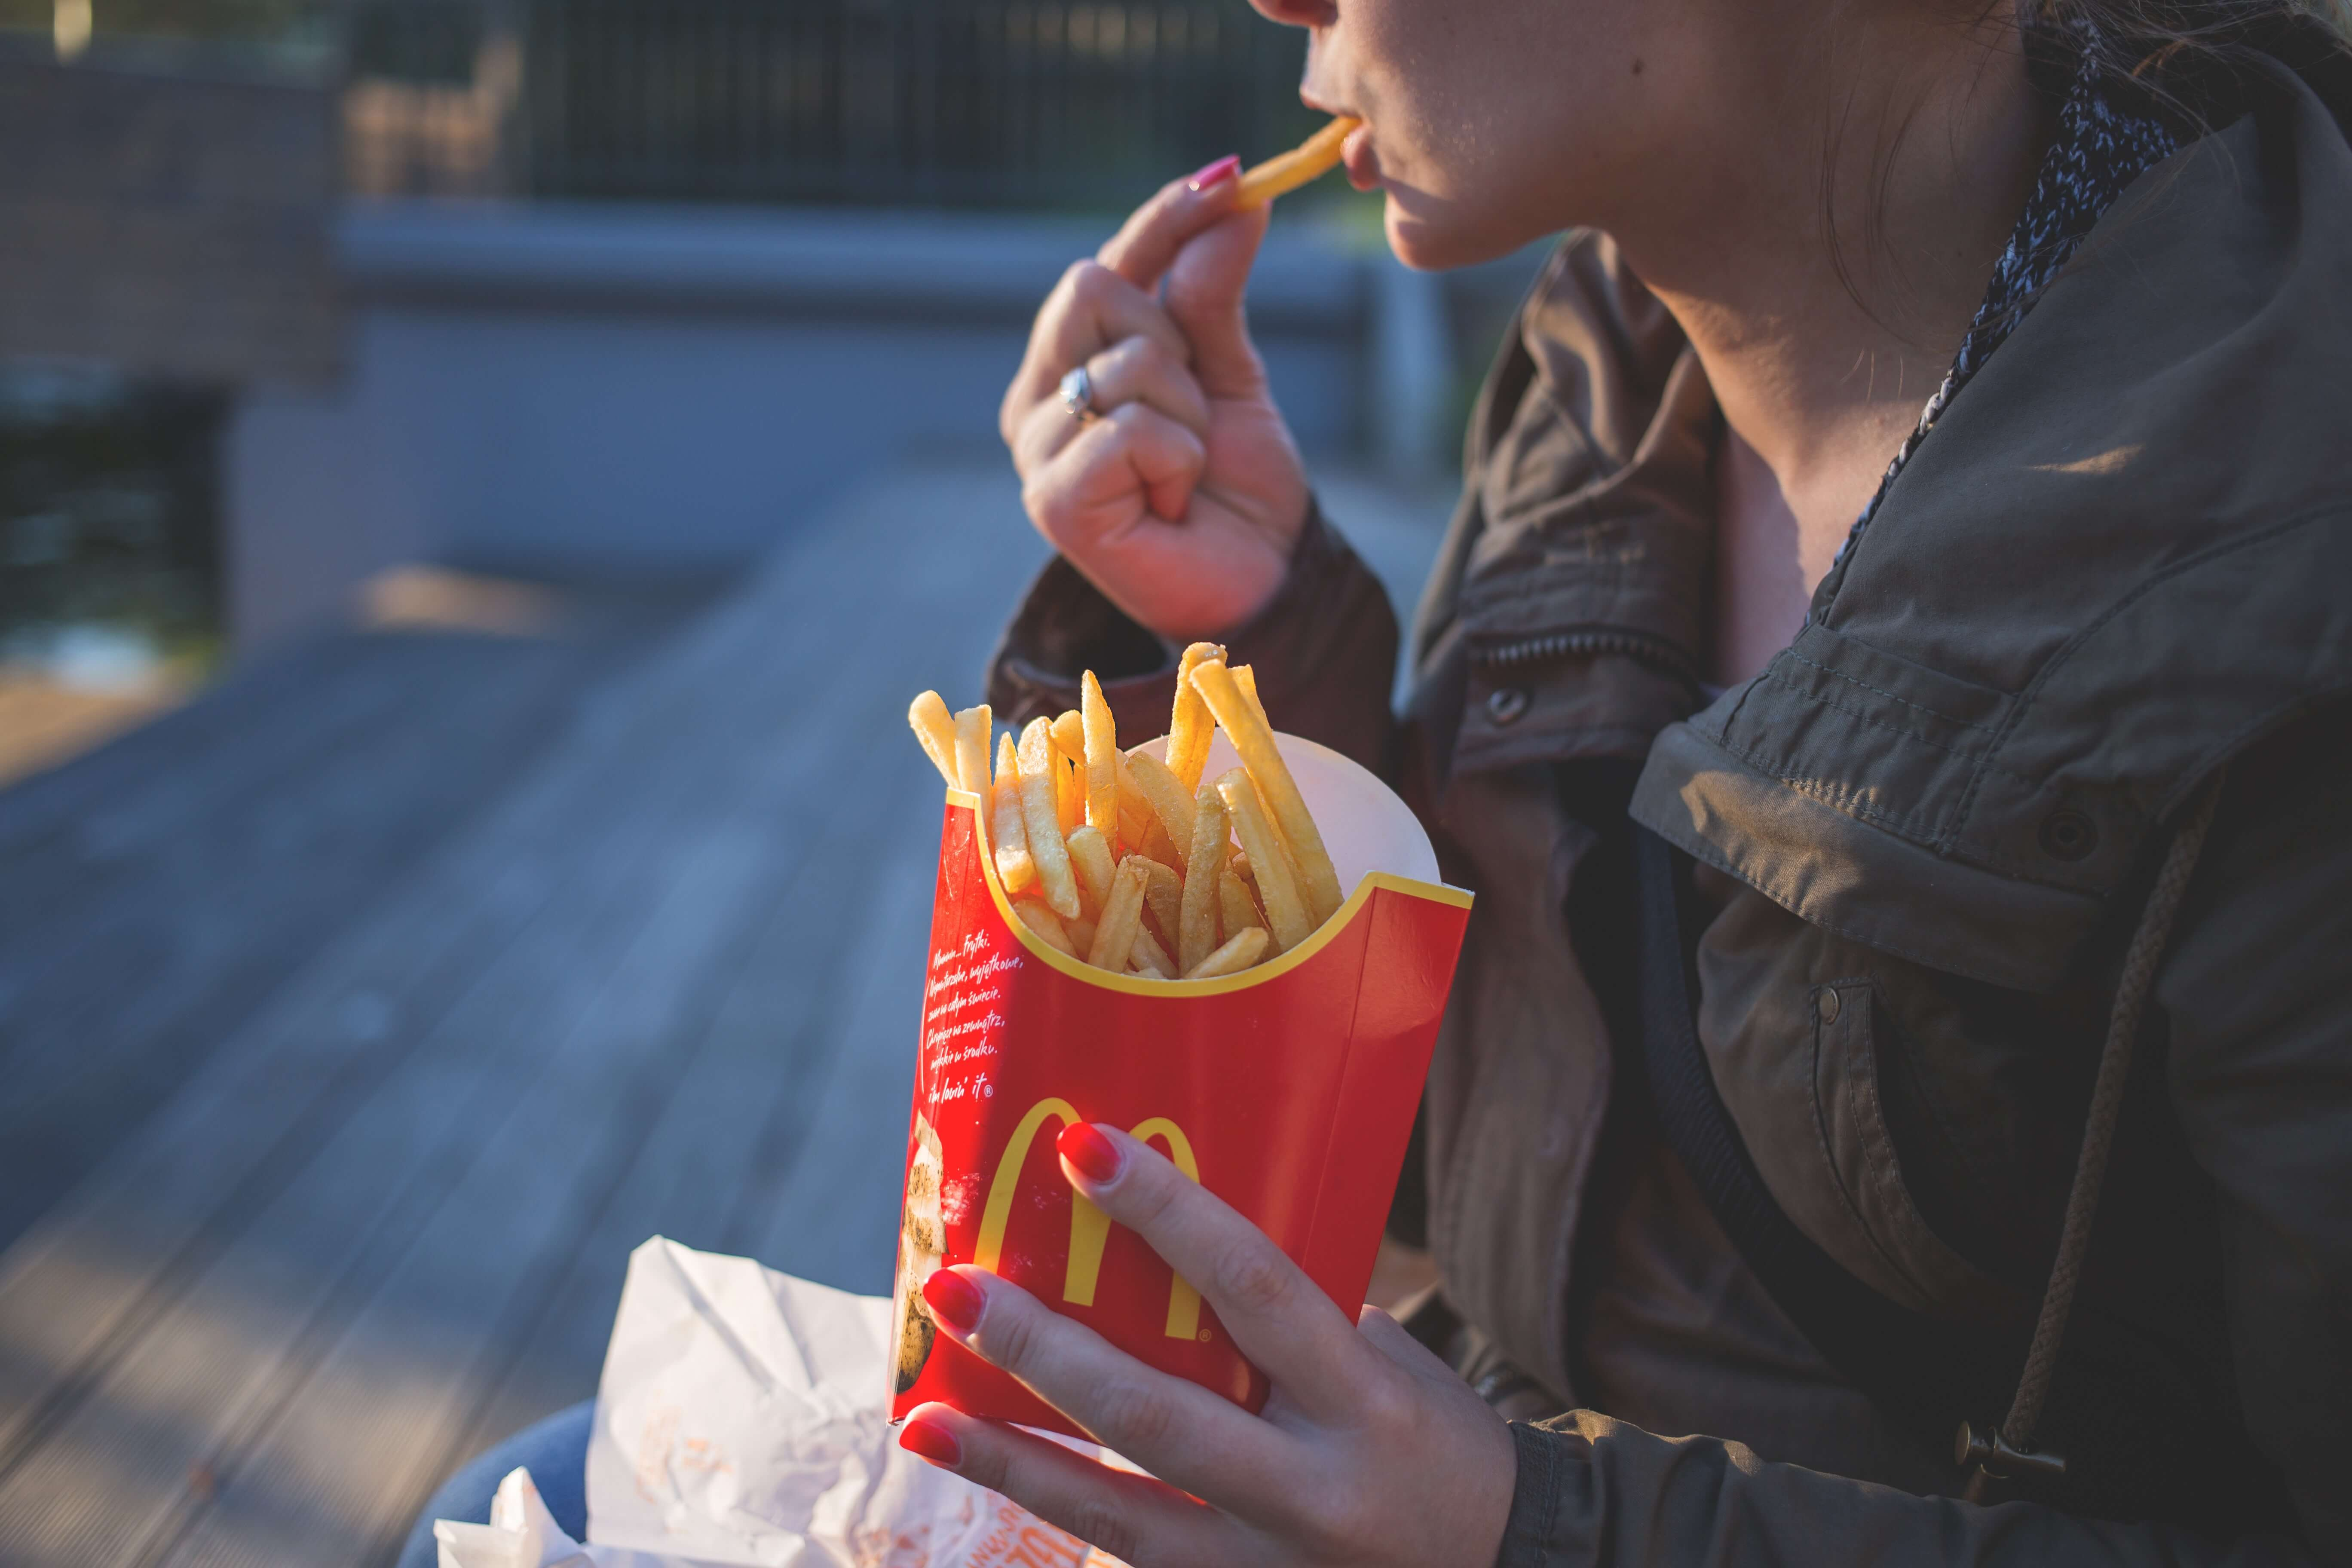 McDonald's fries eating